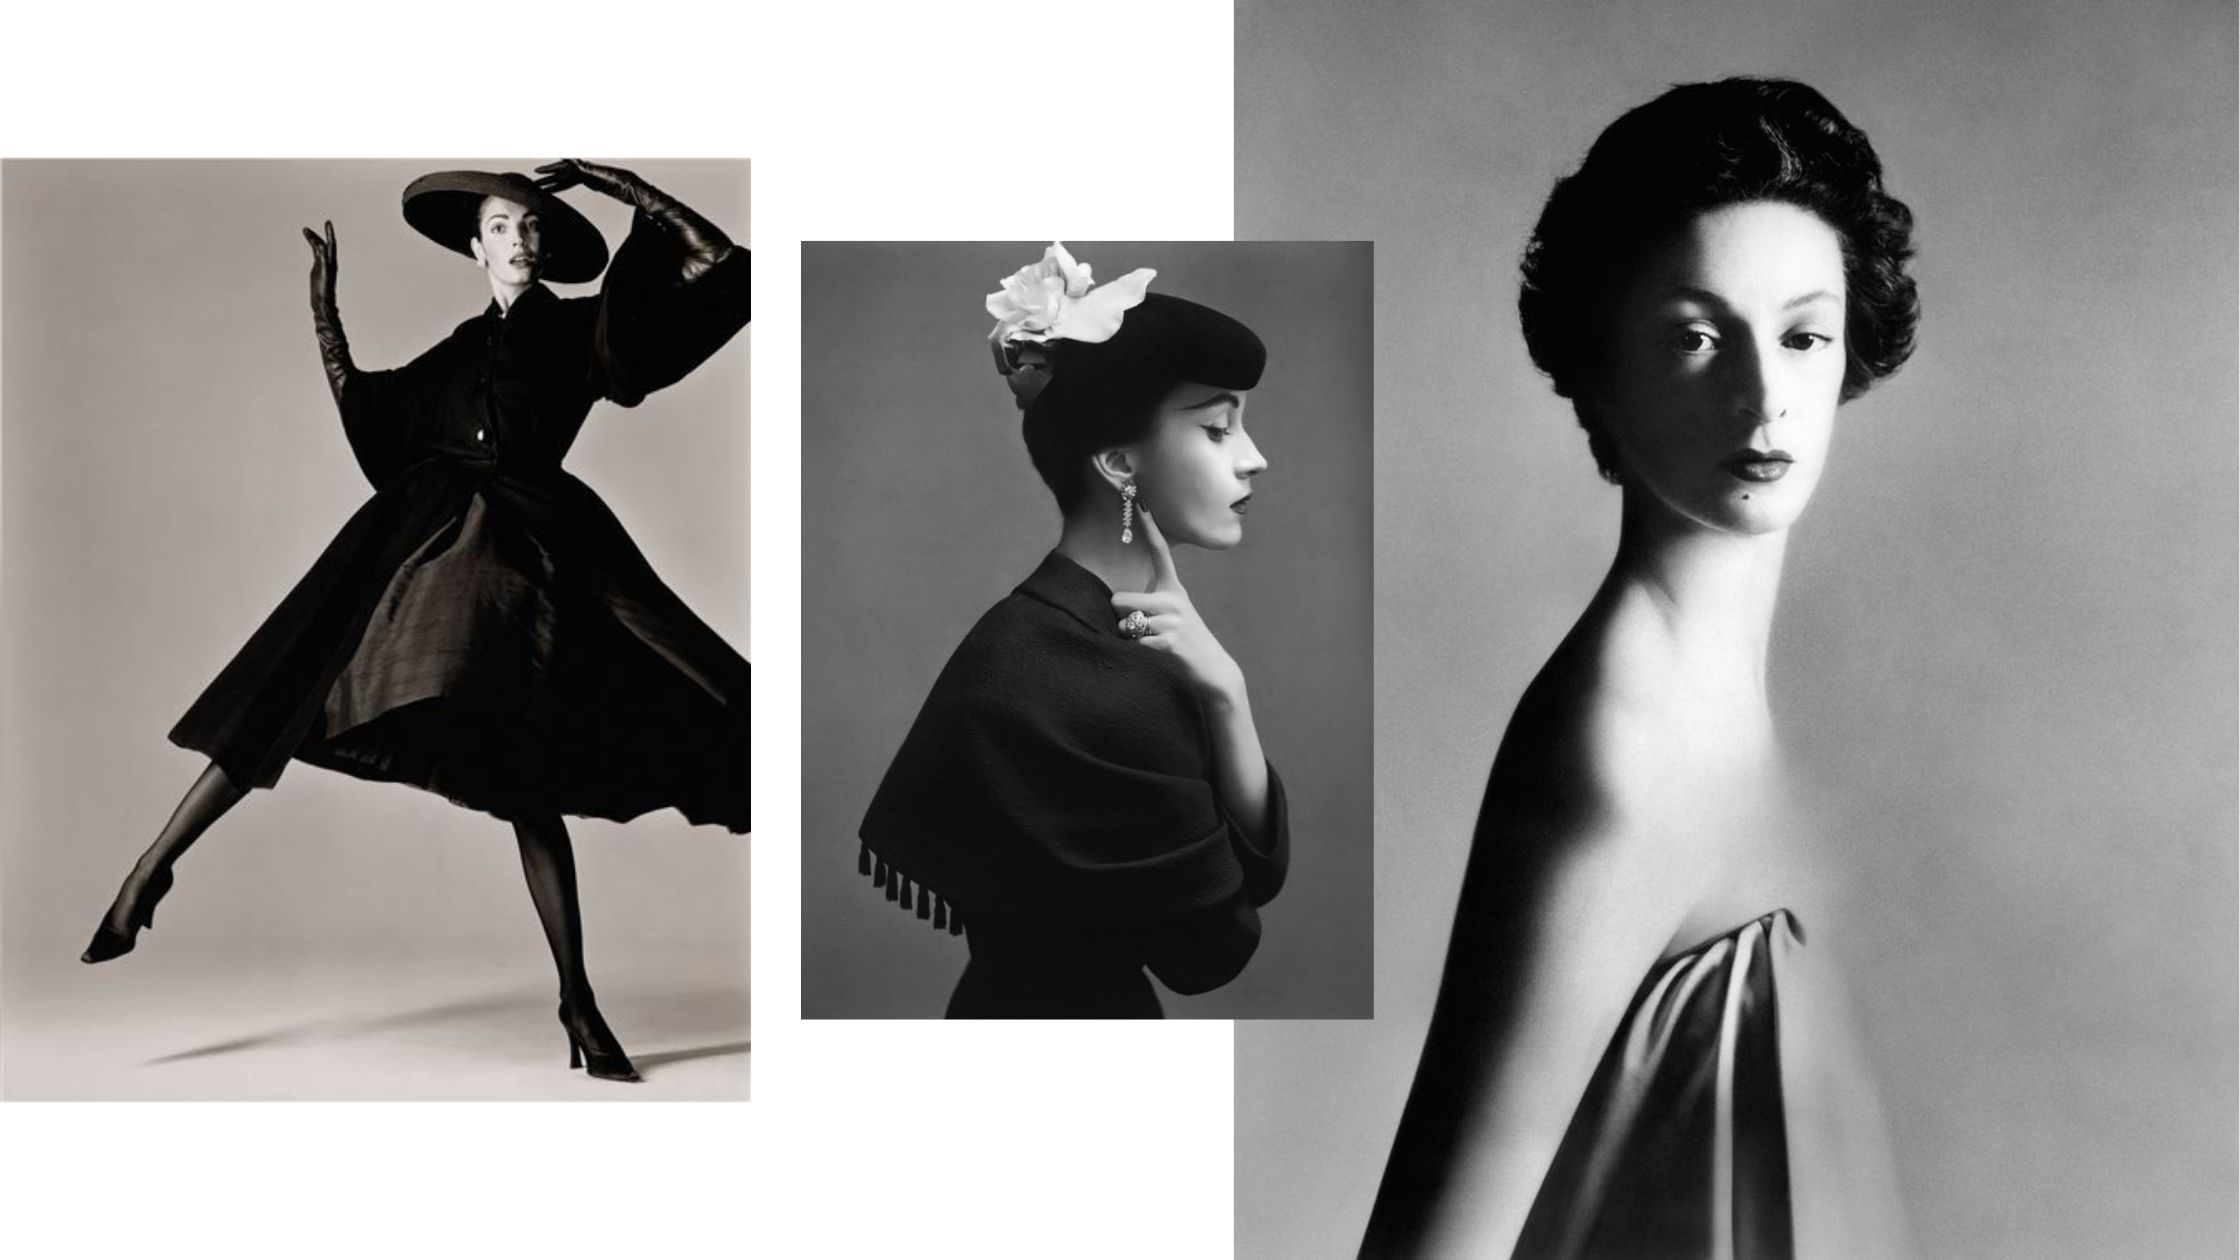 Portraits de femmes par Richard Avedon, circa 1950